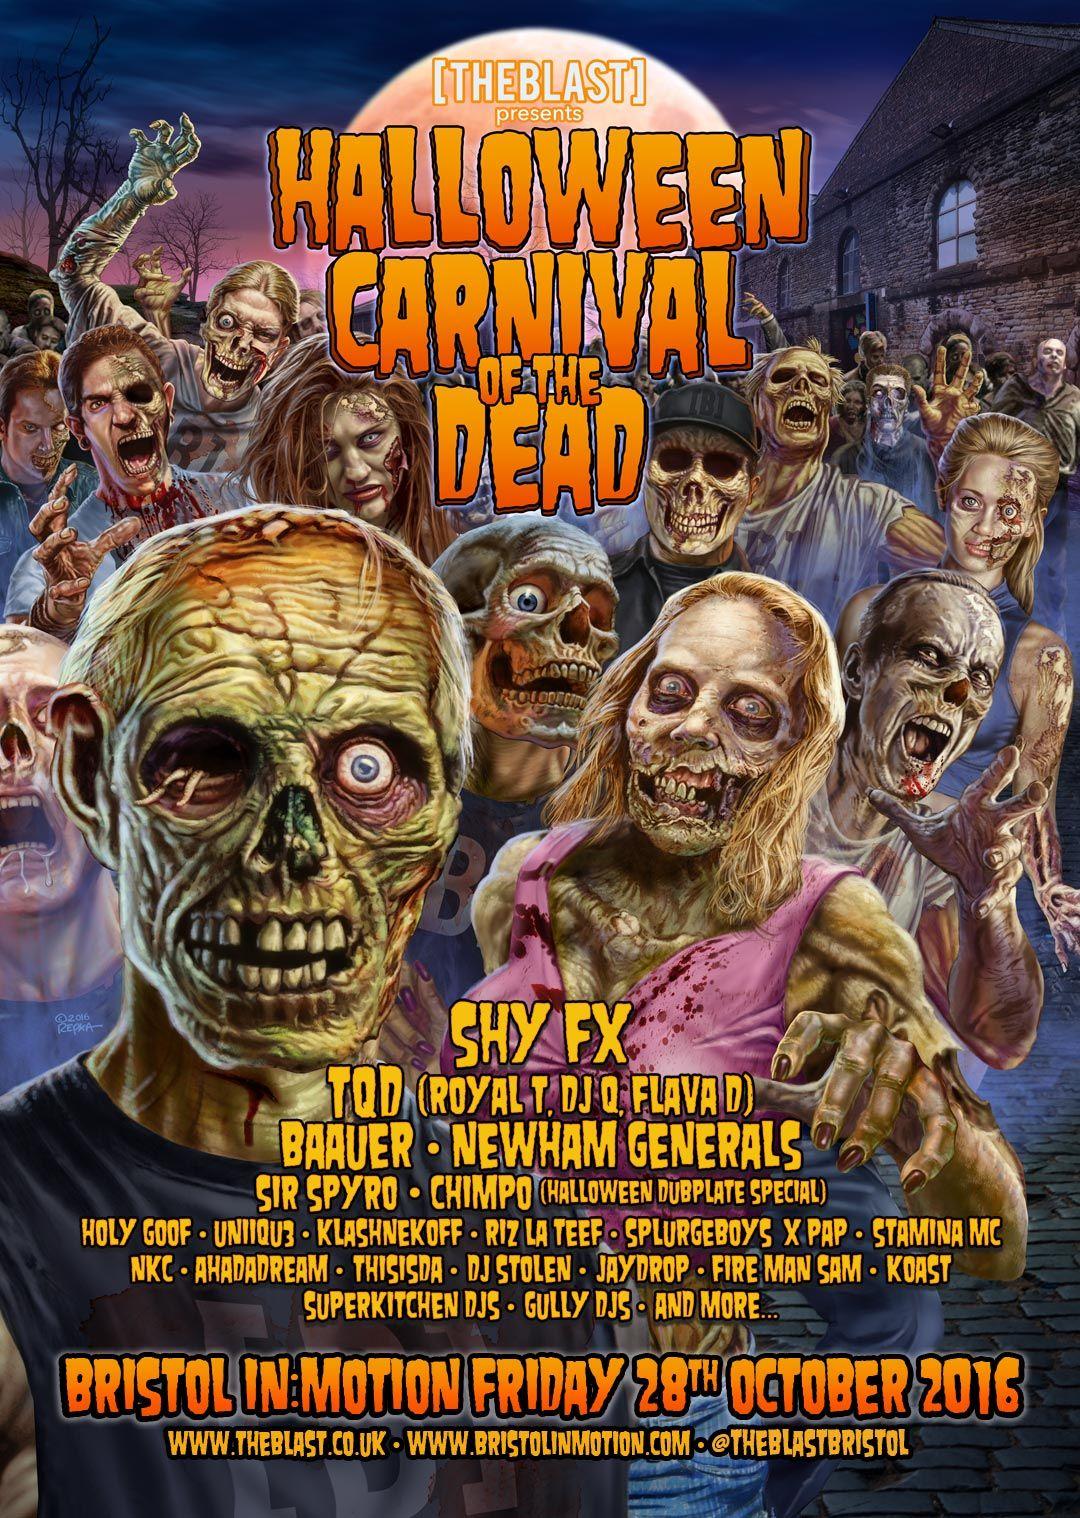 Ed repka x the blast halloween 2016 horror movie posters